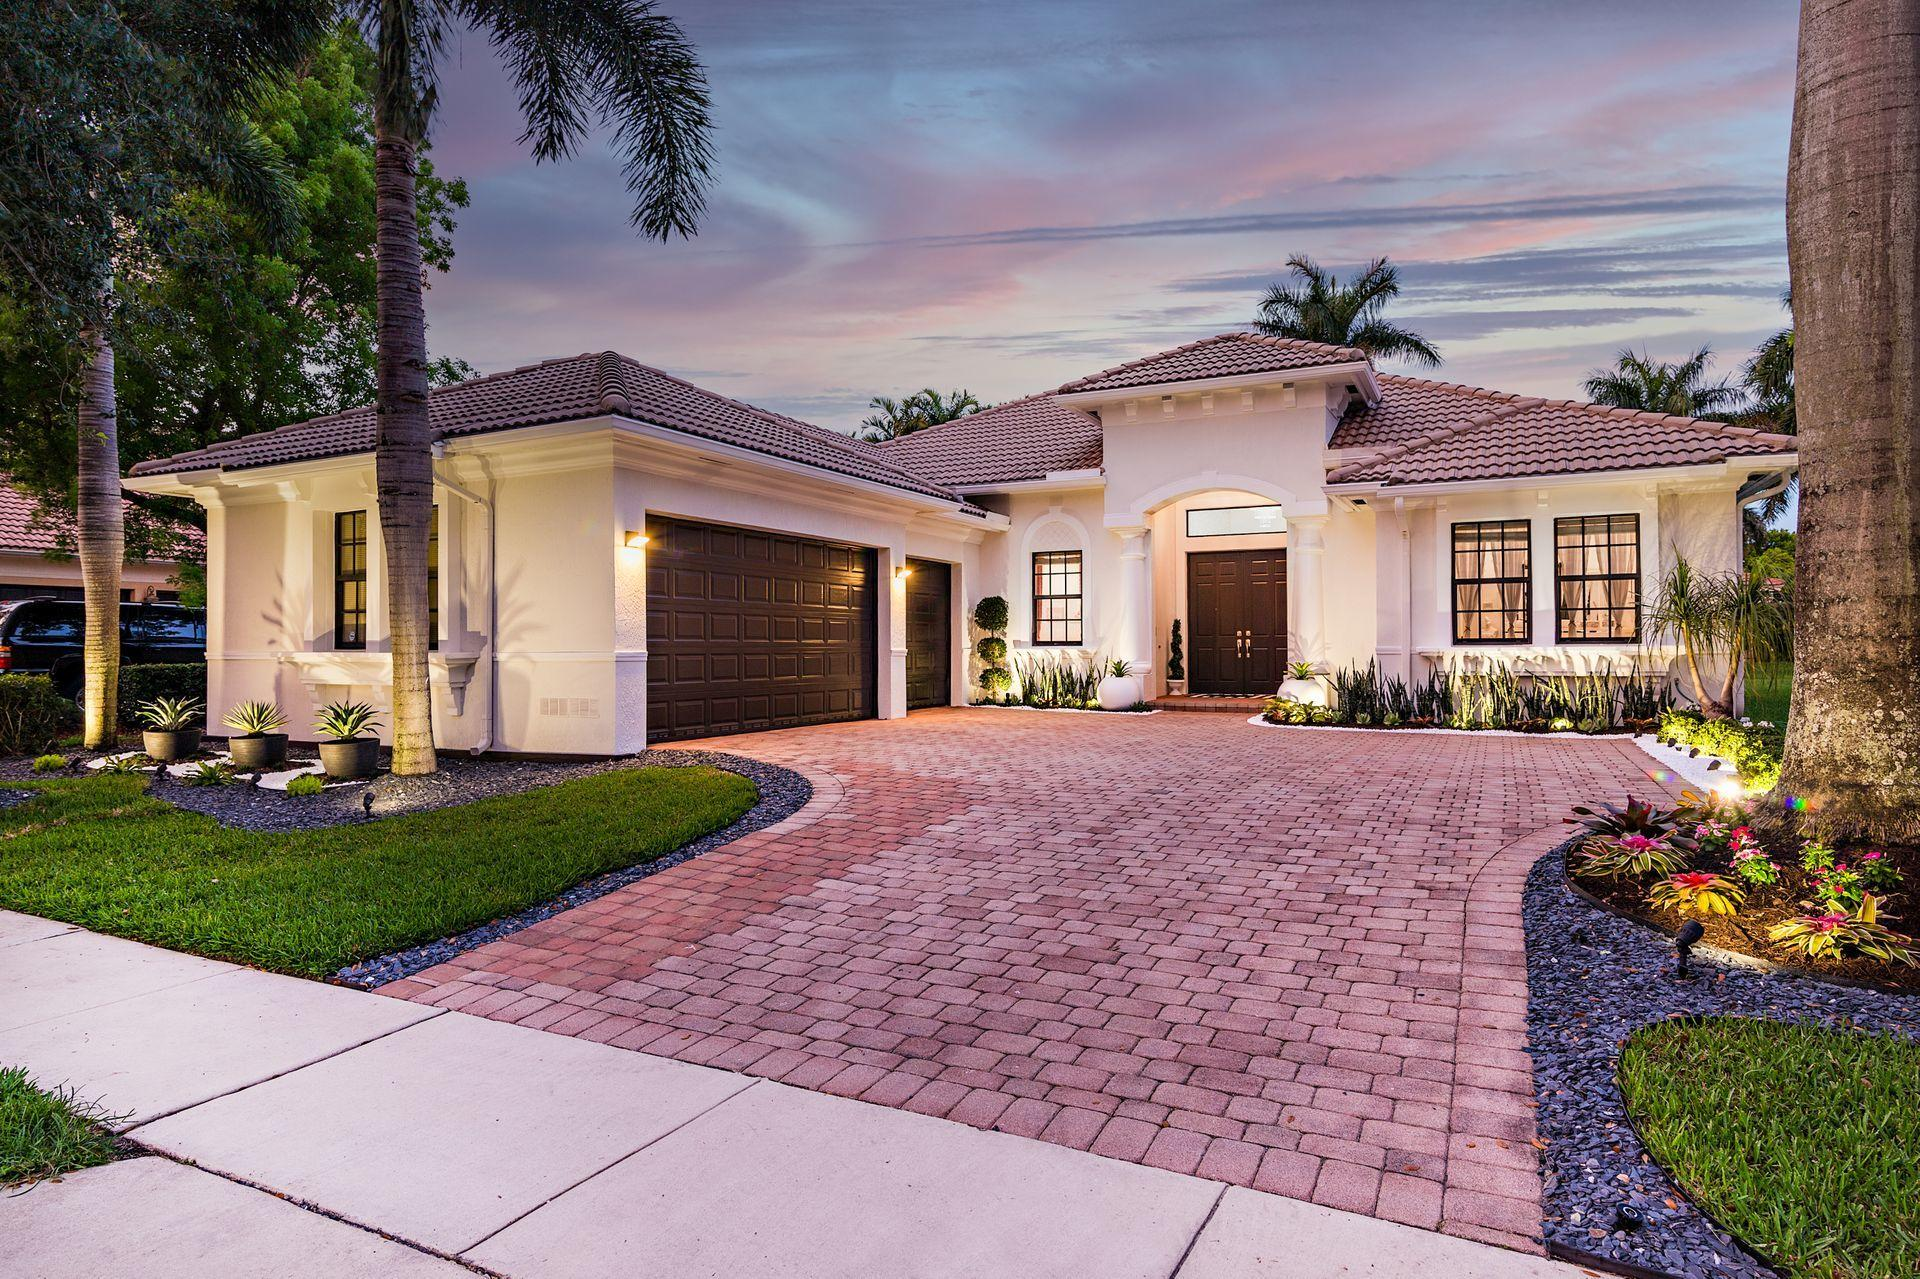 15986 Rosecroft Terrace, Delray Beach, Florida 33446, 4 Bedrooms Bedrooms, ,4 BathroomsBathrooms,Single Family Detached,For Sale,Rosecroft,RX-10713793